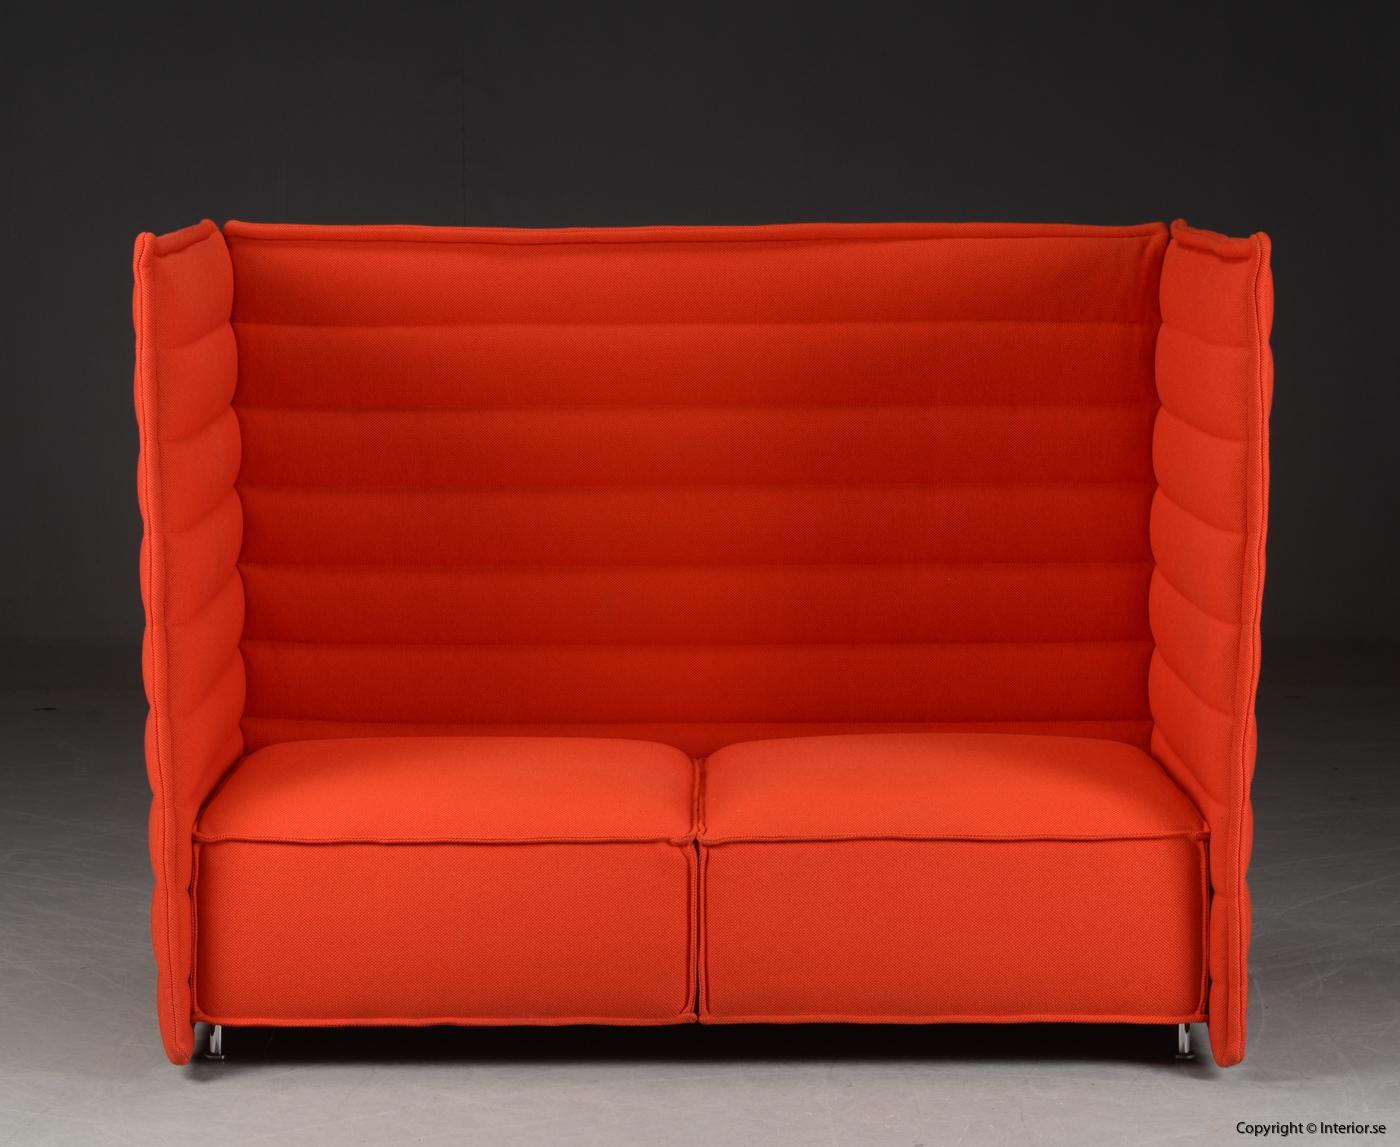 Soffa sofa med hög rygg, Vitra Alcove 2-sits 2 seater - Erwan & Ronan Bouroullec 2